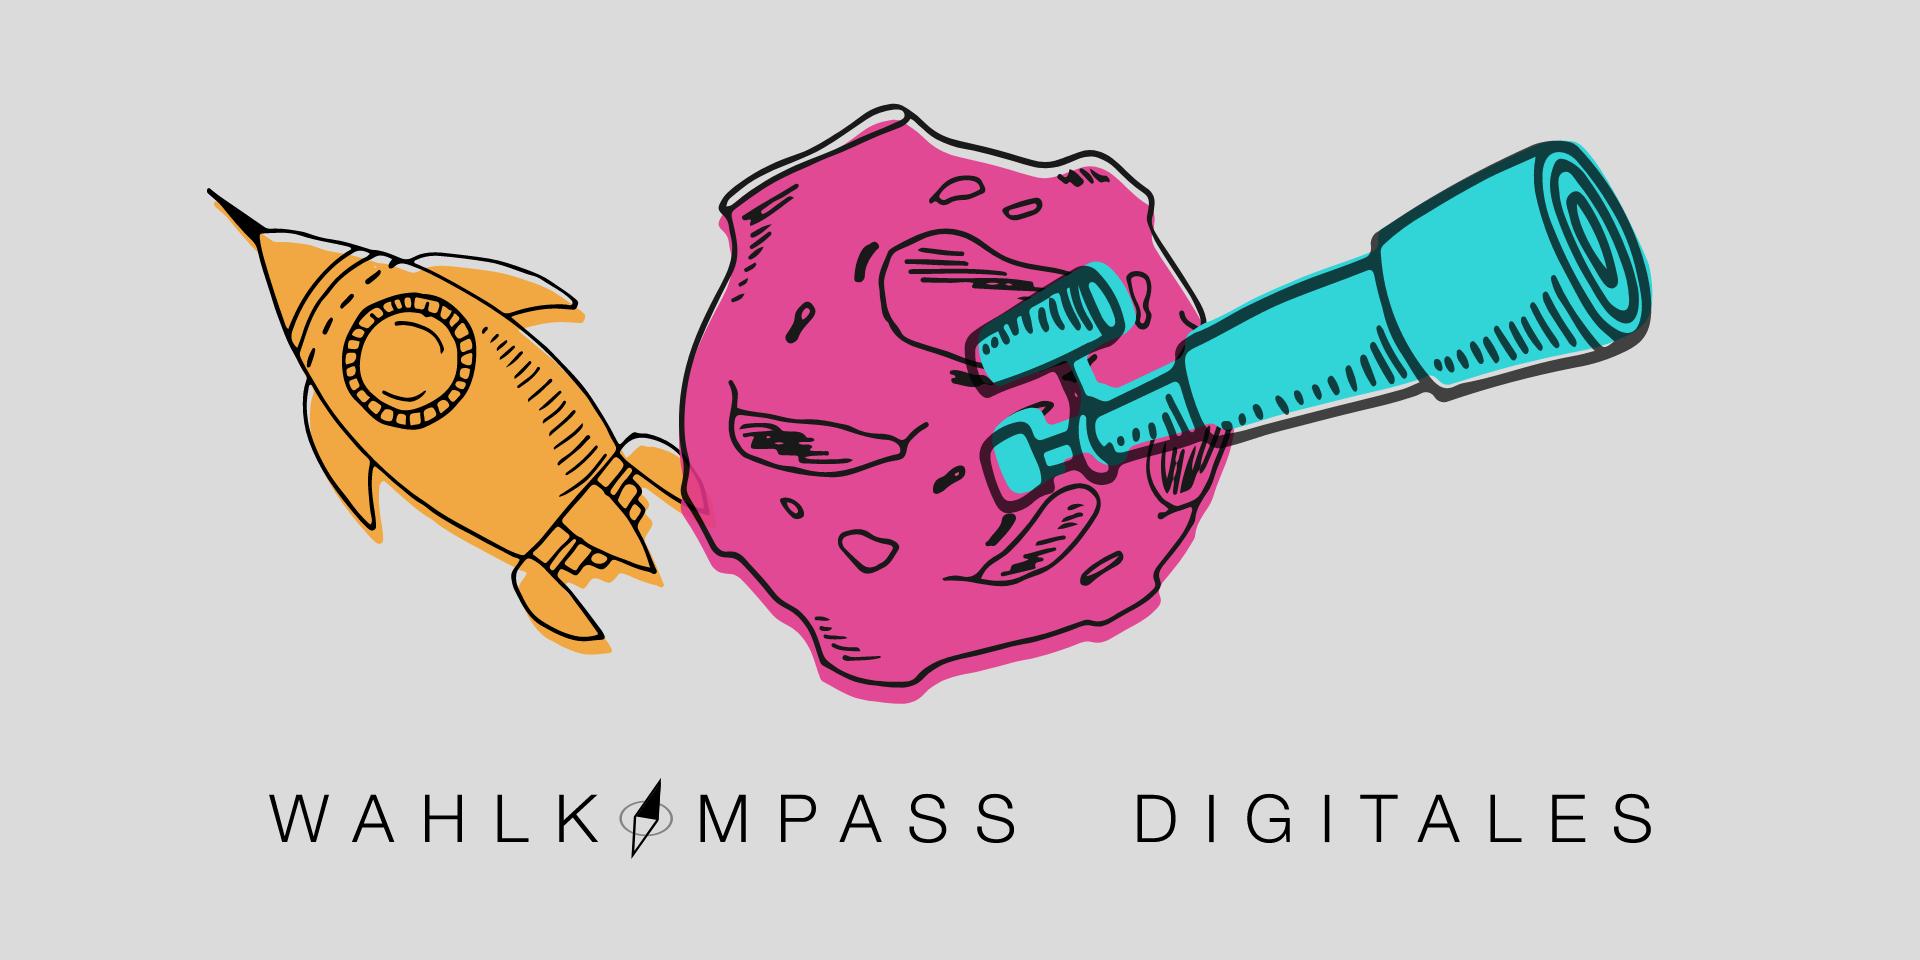 Wahlkompass Digitales 2021